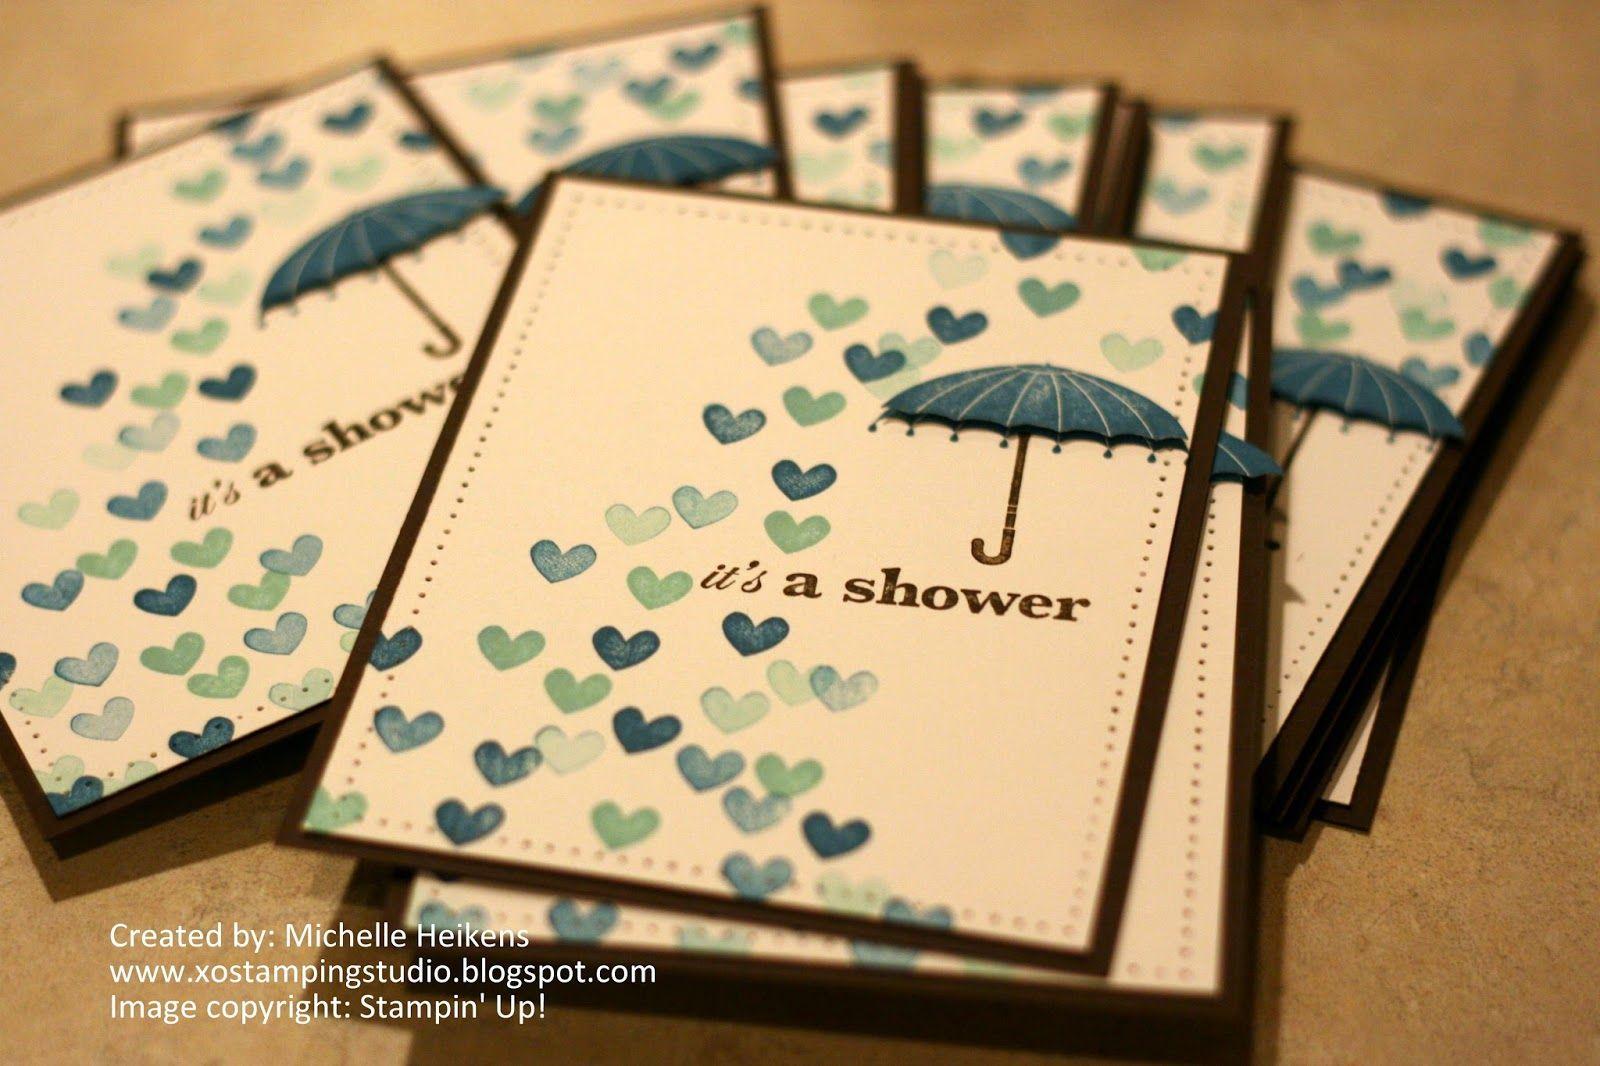 Baby shower invites stampin up rain or shine michelle heikens baby shower invites stampin up rain or shine michelle heikens xostampingstudiospot filmwisefo